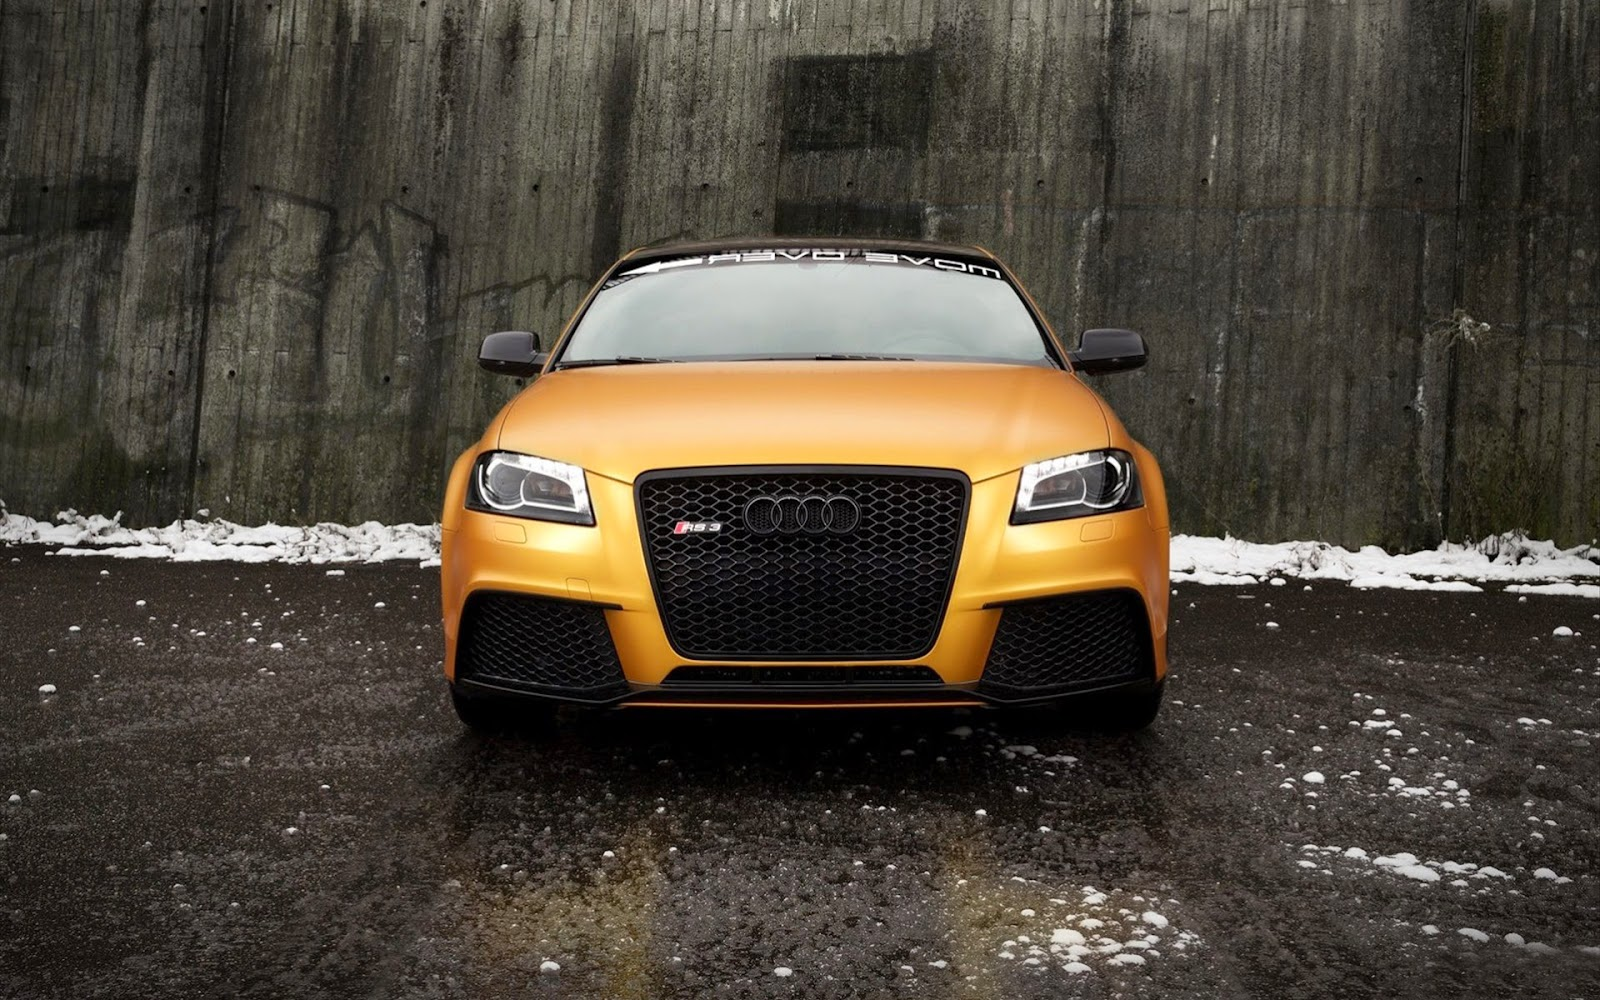 "<img src=""http://4.bp.blogspot.com/-OXaD4wohAVs/UzXULX9BAOI/AAAAAAAALQE/y6ZPM4cF6Rc/s1600/audi-cars-wallpaper.jpg"" alt=""Audi Wallpapers"" />"